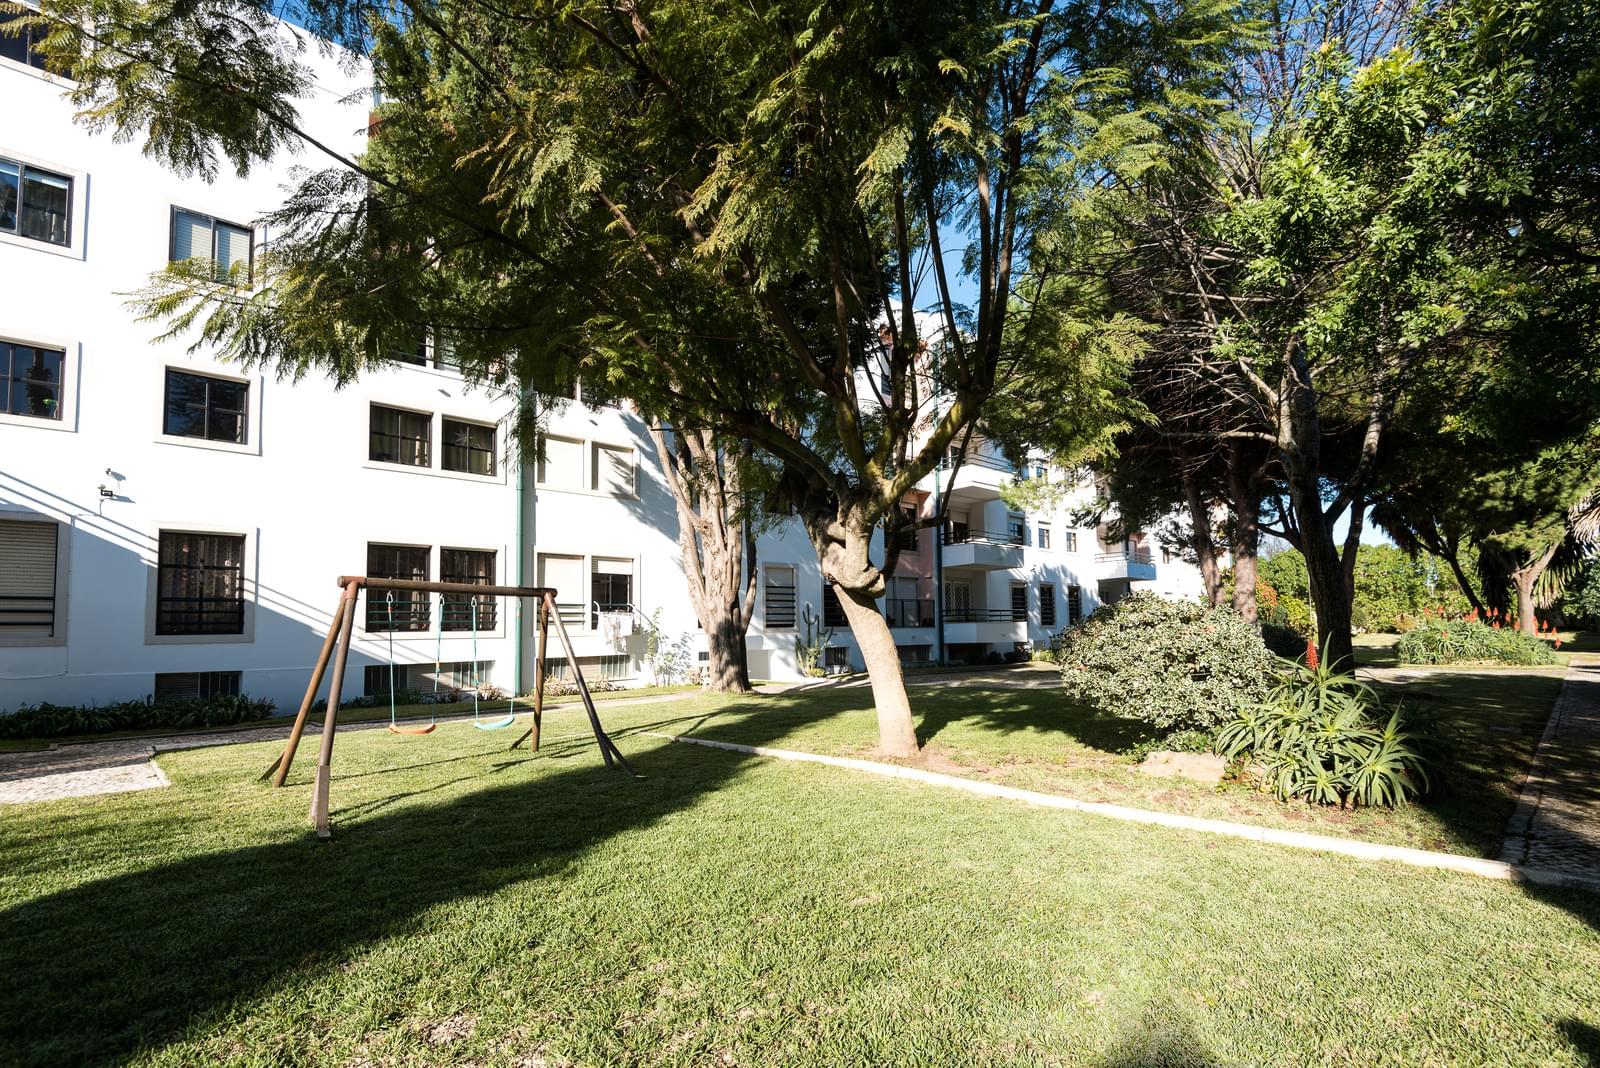 pf18963-apartamento-t5-cascais-61a09f54-6bea-4aca-9fd3-8a84e91d0d93